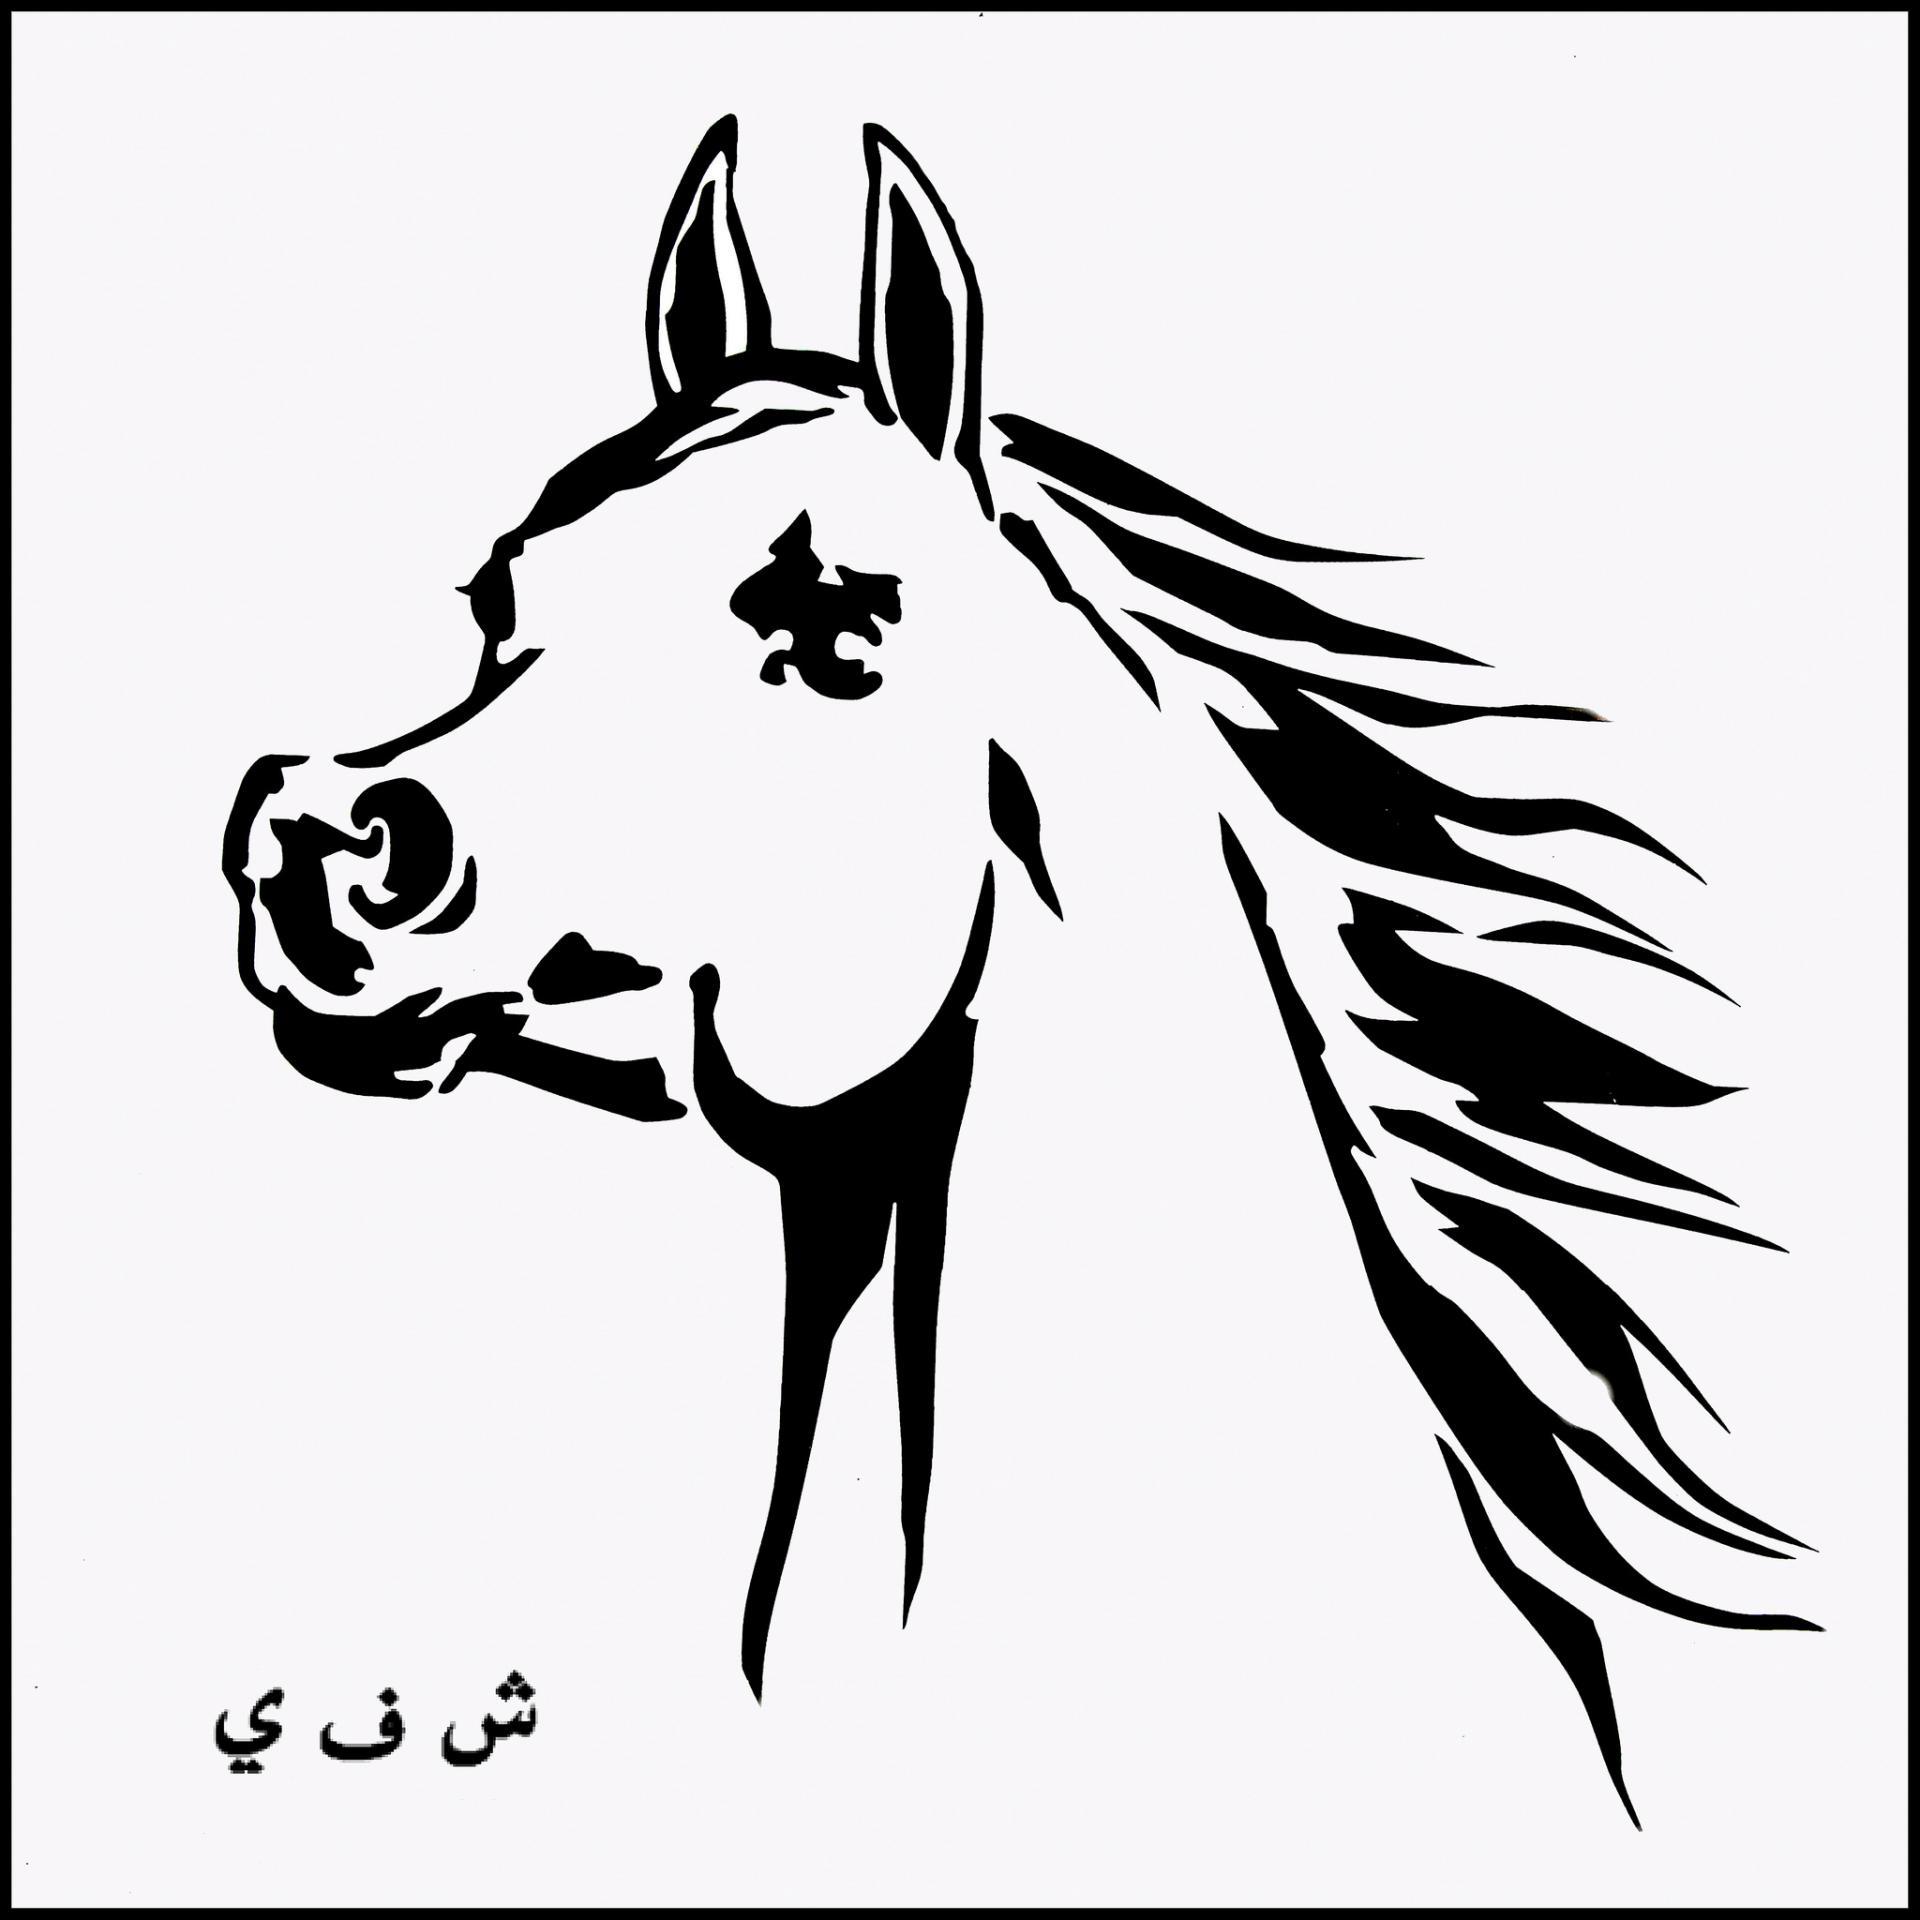 Al Jahid